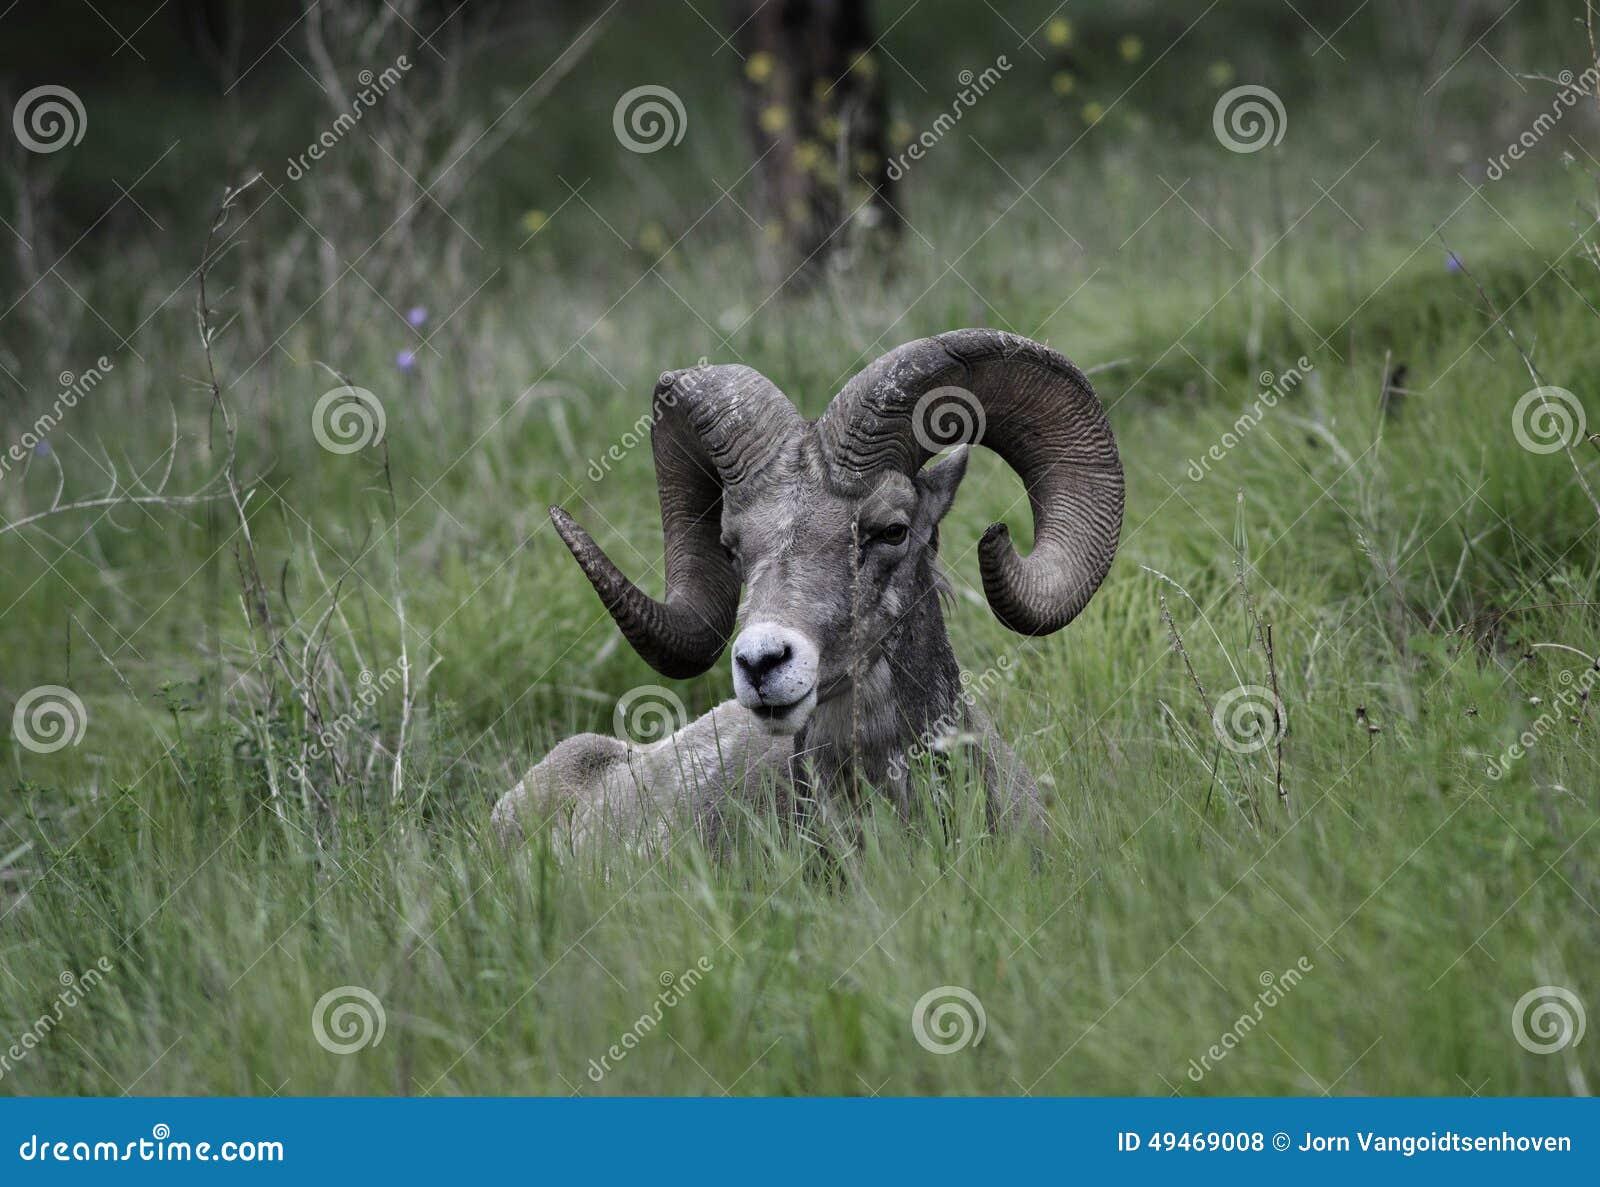 Ram dos carneiros de Bighorn